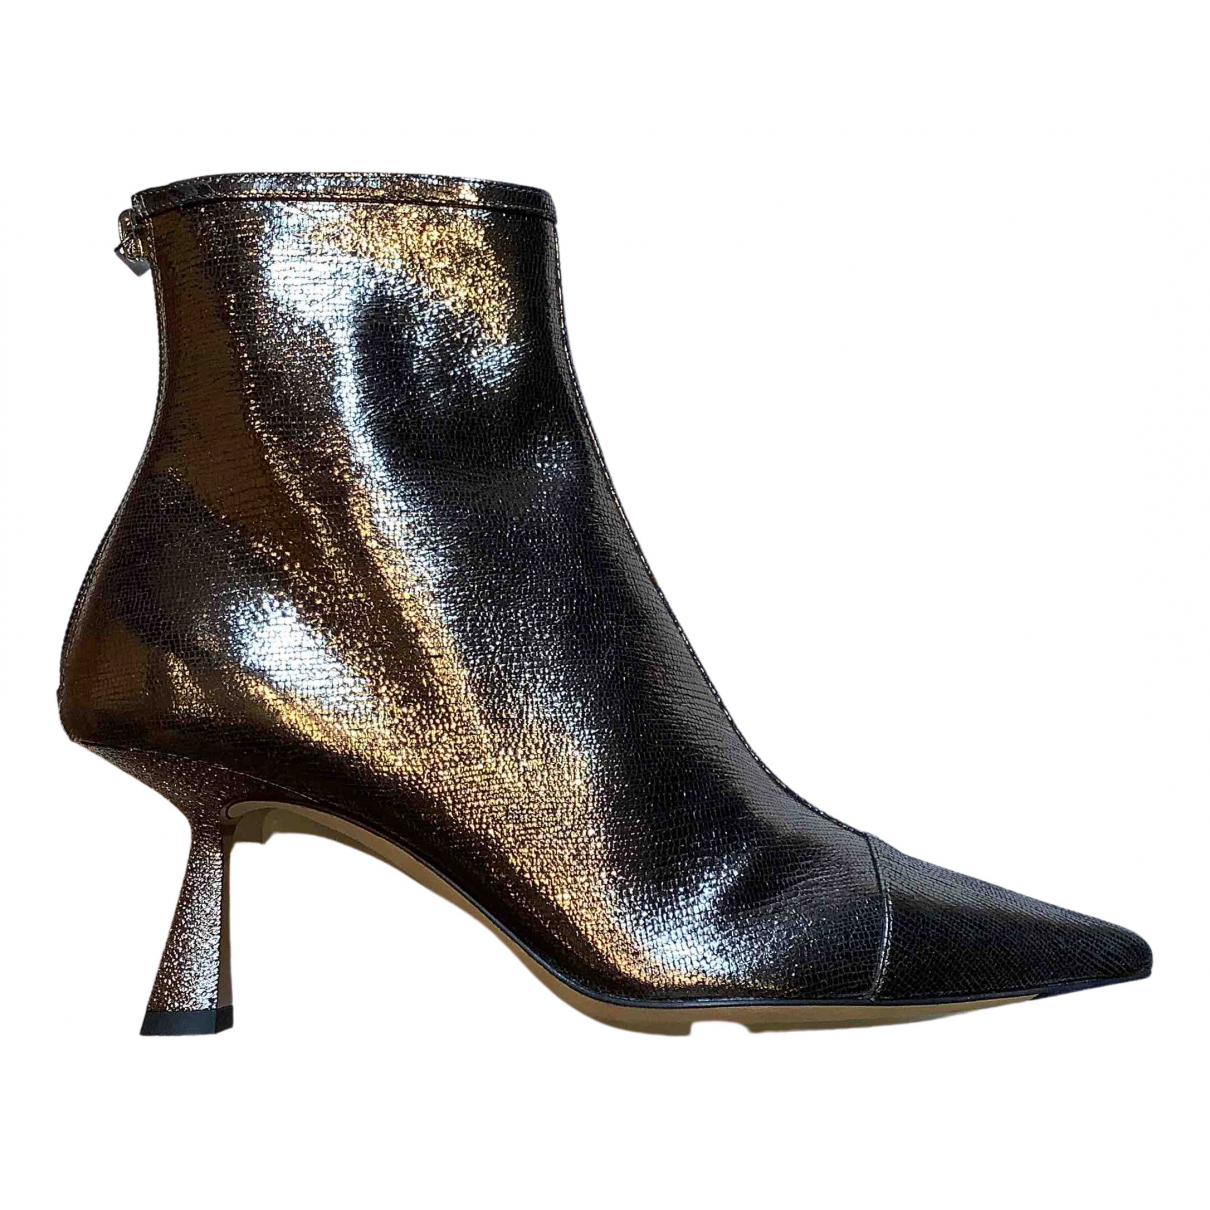 Jimmy Choo \N Metallic Leather Boots for Women 37 EU